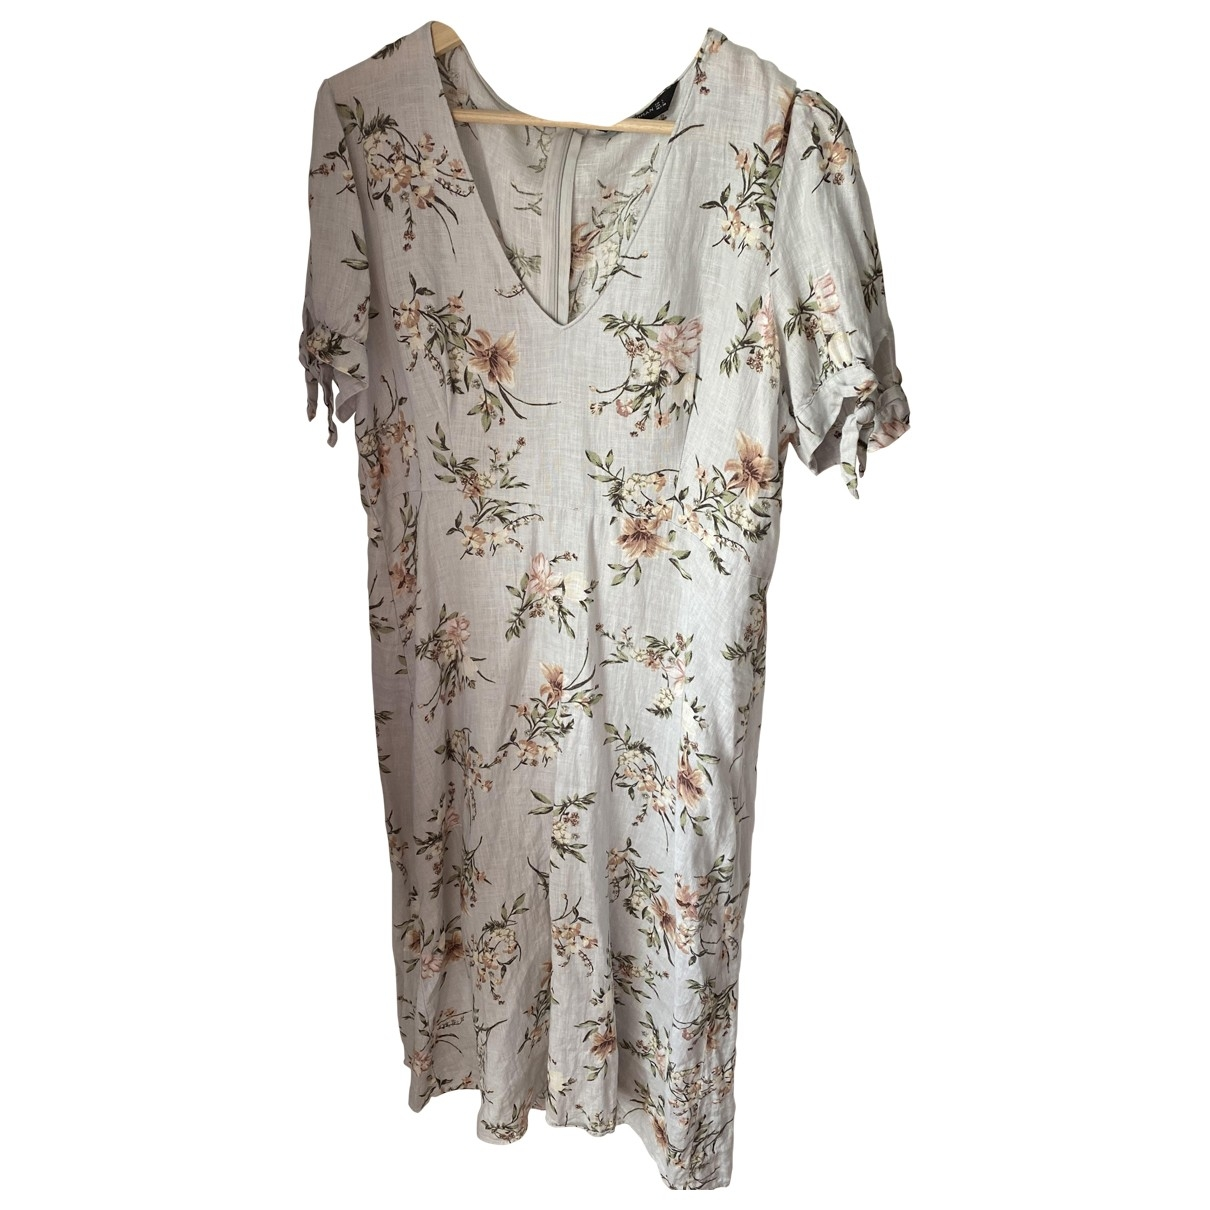 Zara \N Multicolour Linen dress for Women L International